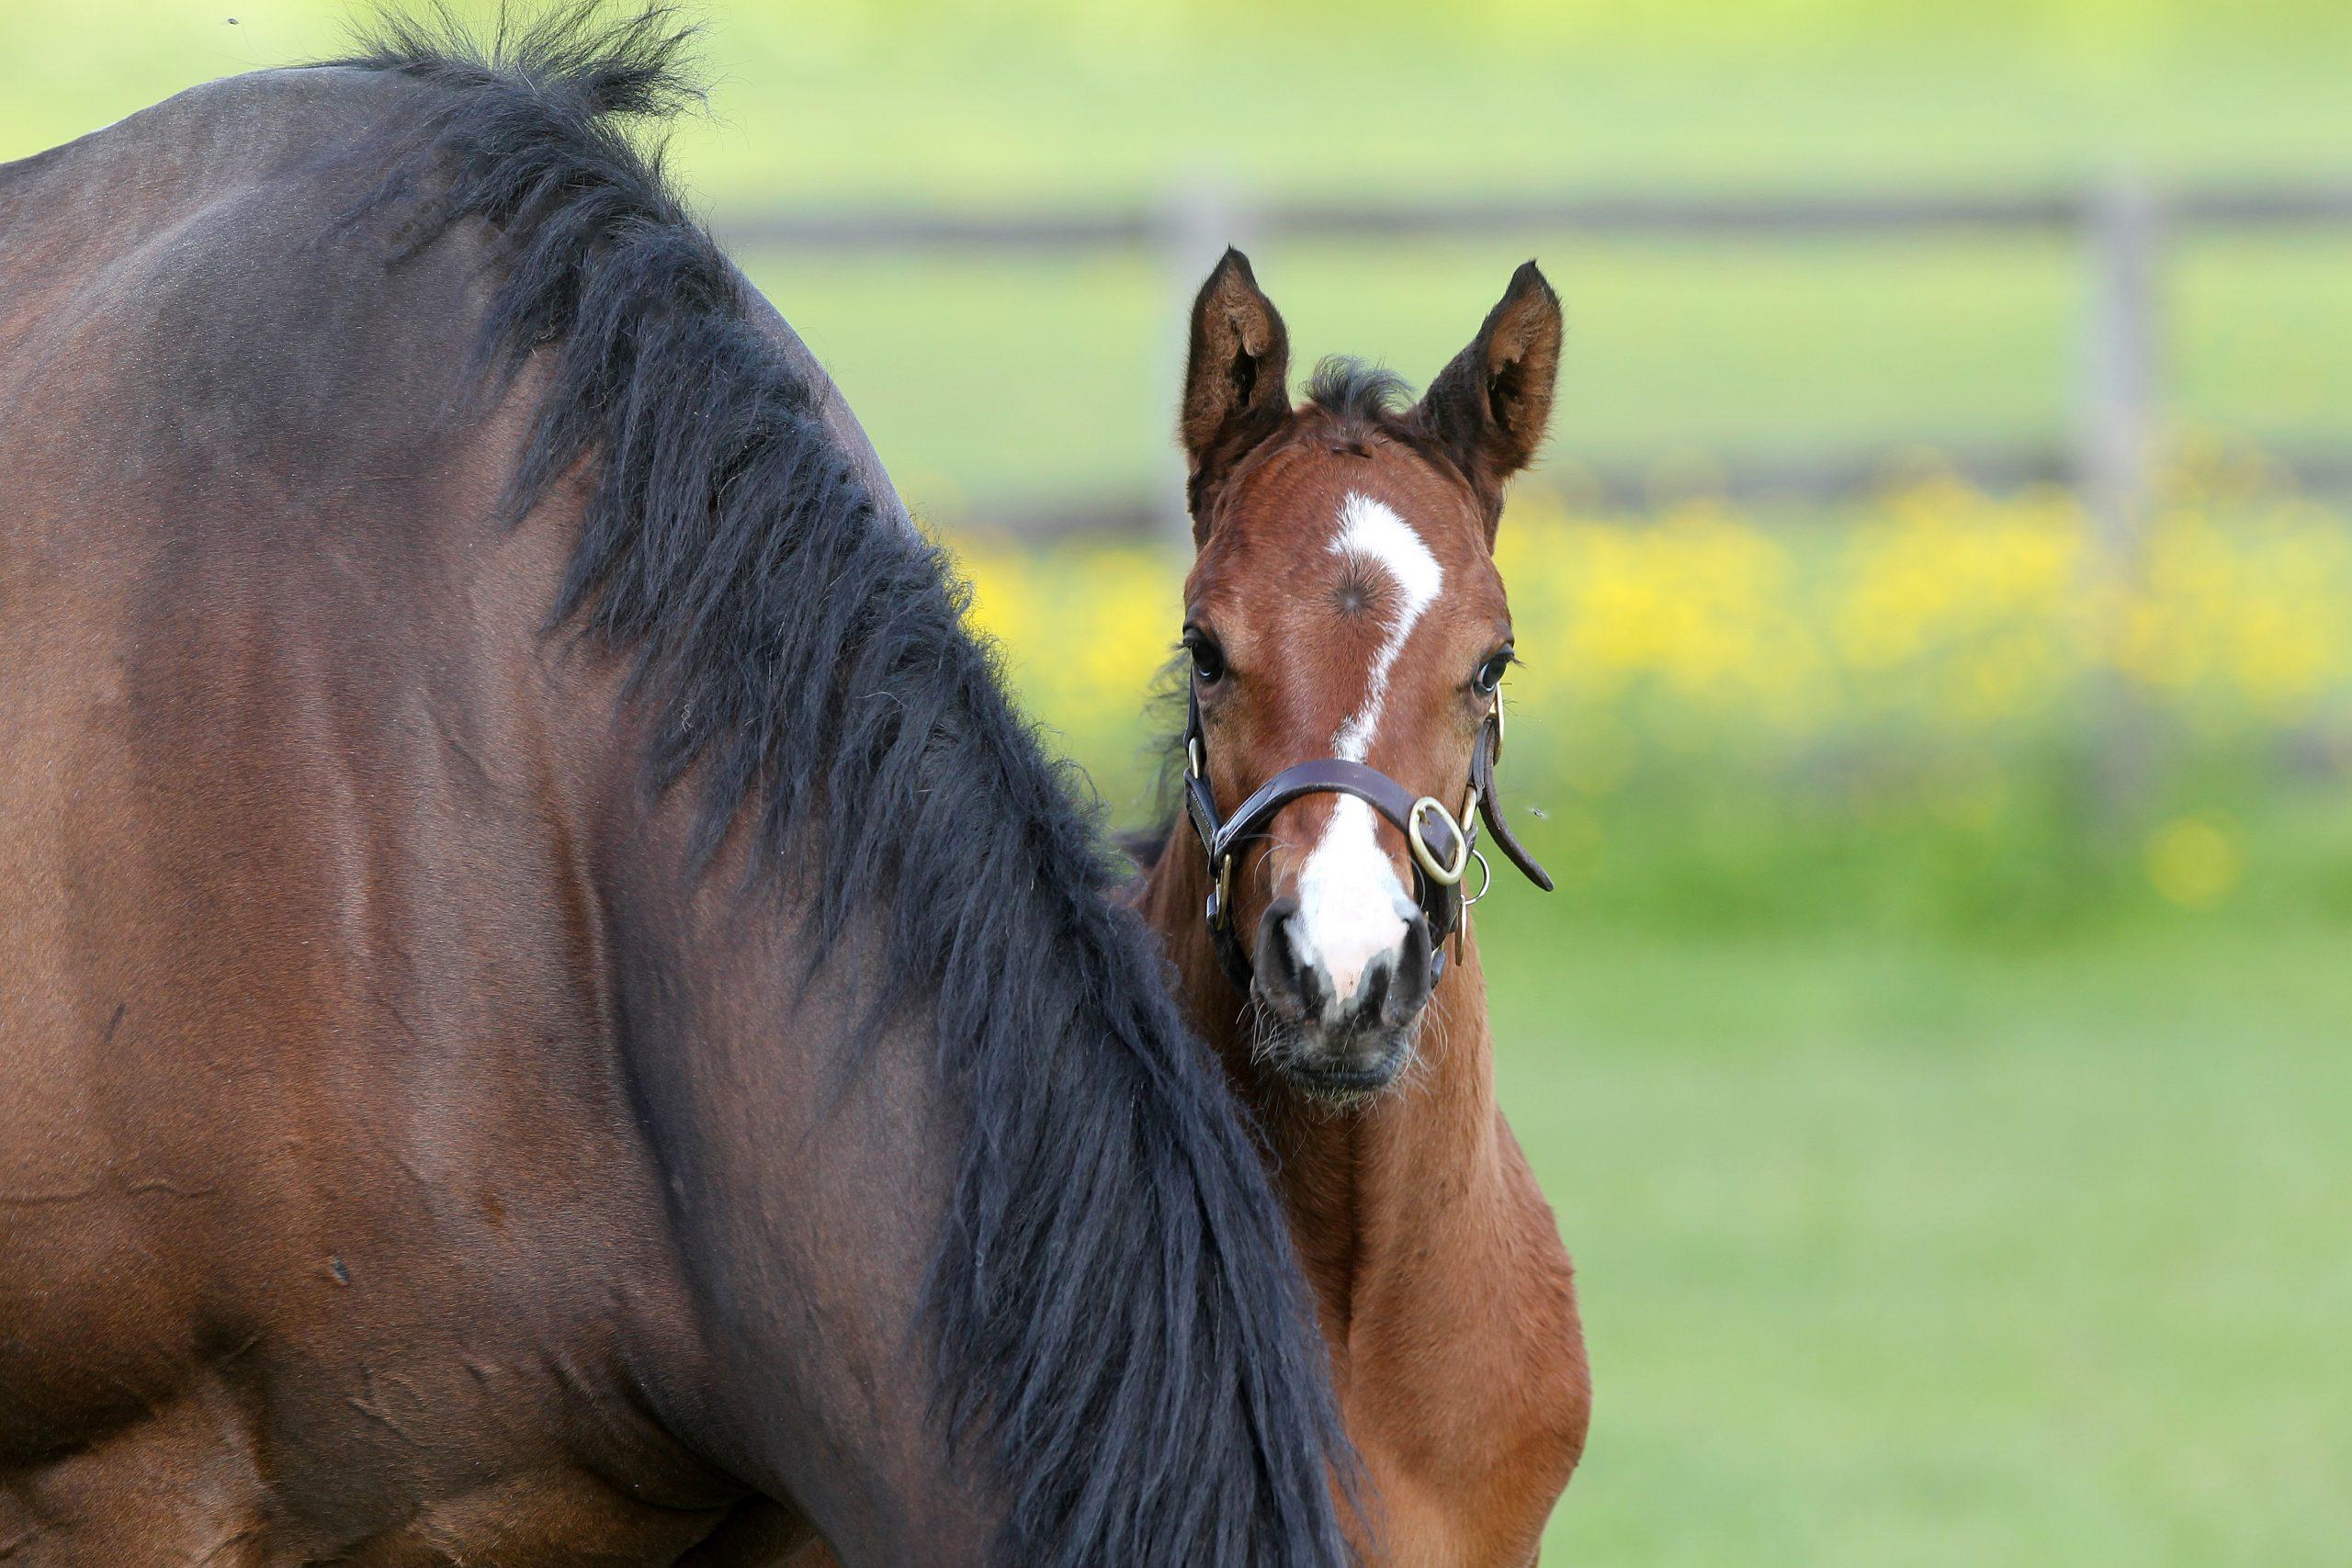 Foaling Season Ready? – Tips for Tackling your Foaling Kit